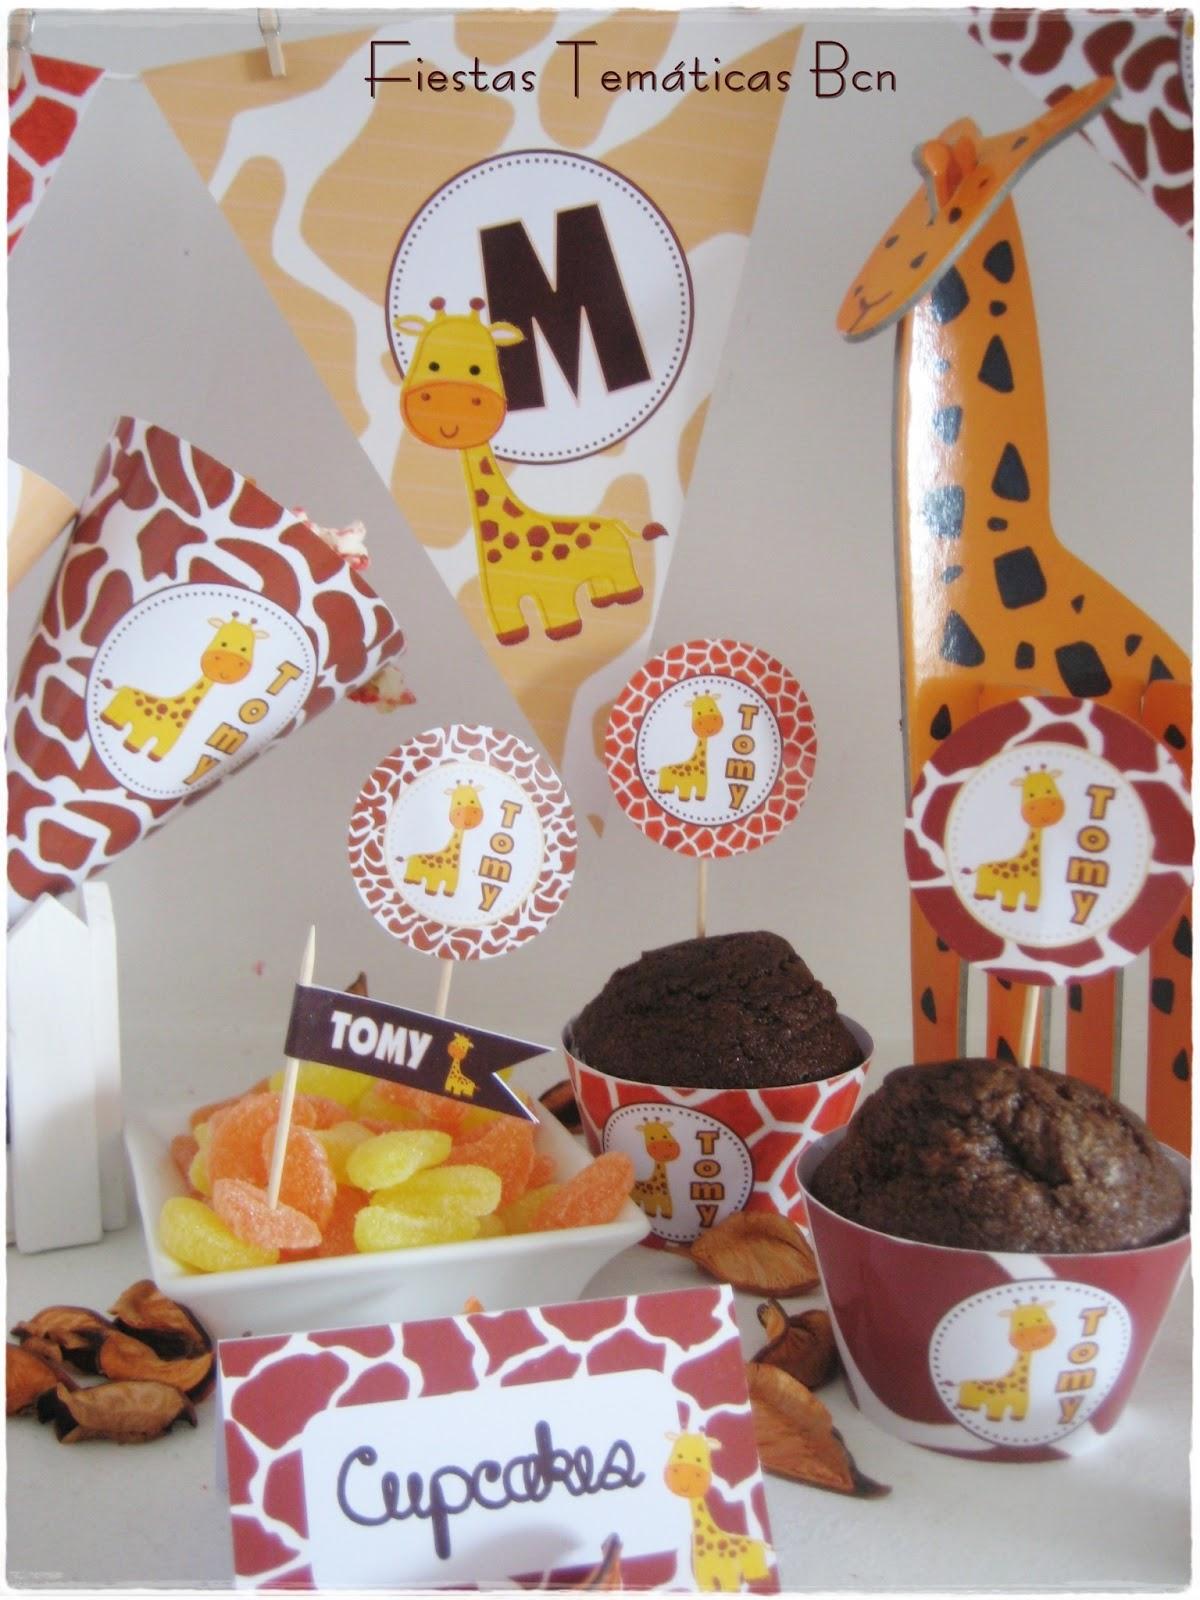 Fiestas tem ticas bcn kits de fiesta imprimibles kit for Fiestas tematicas bcn